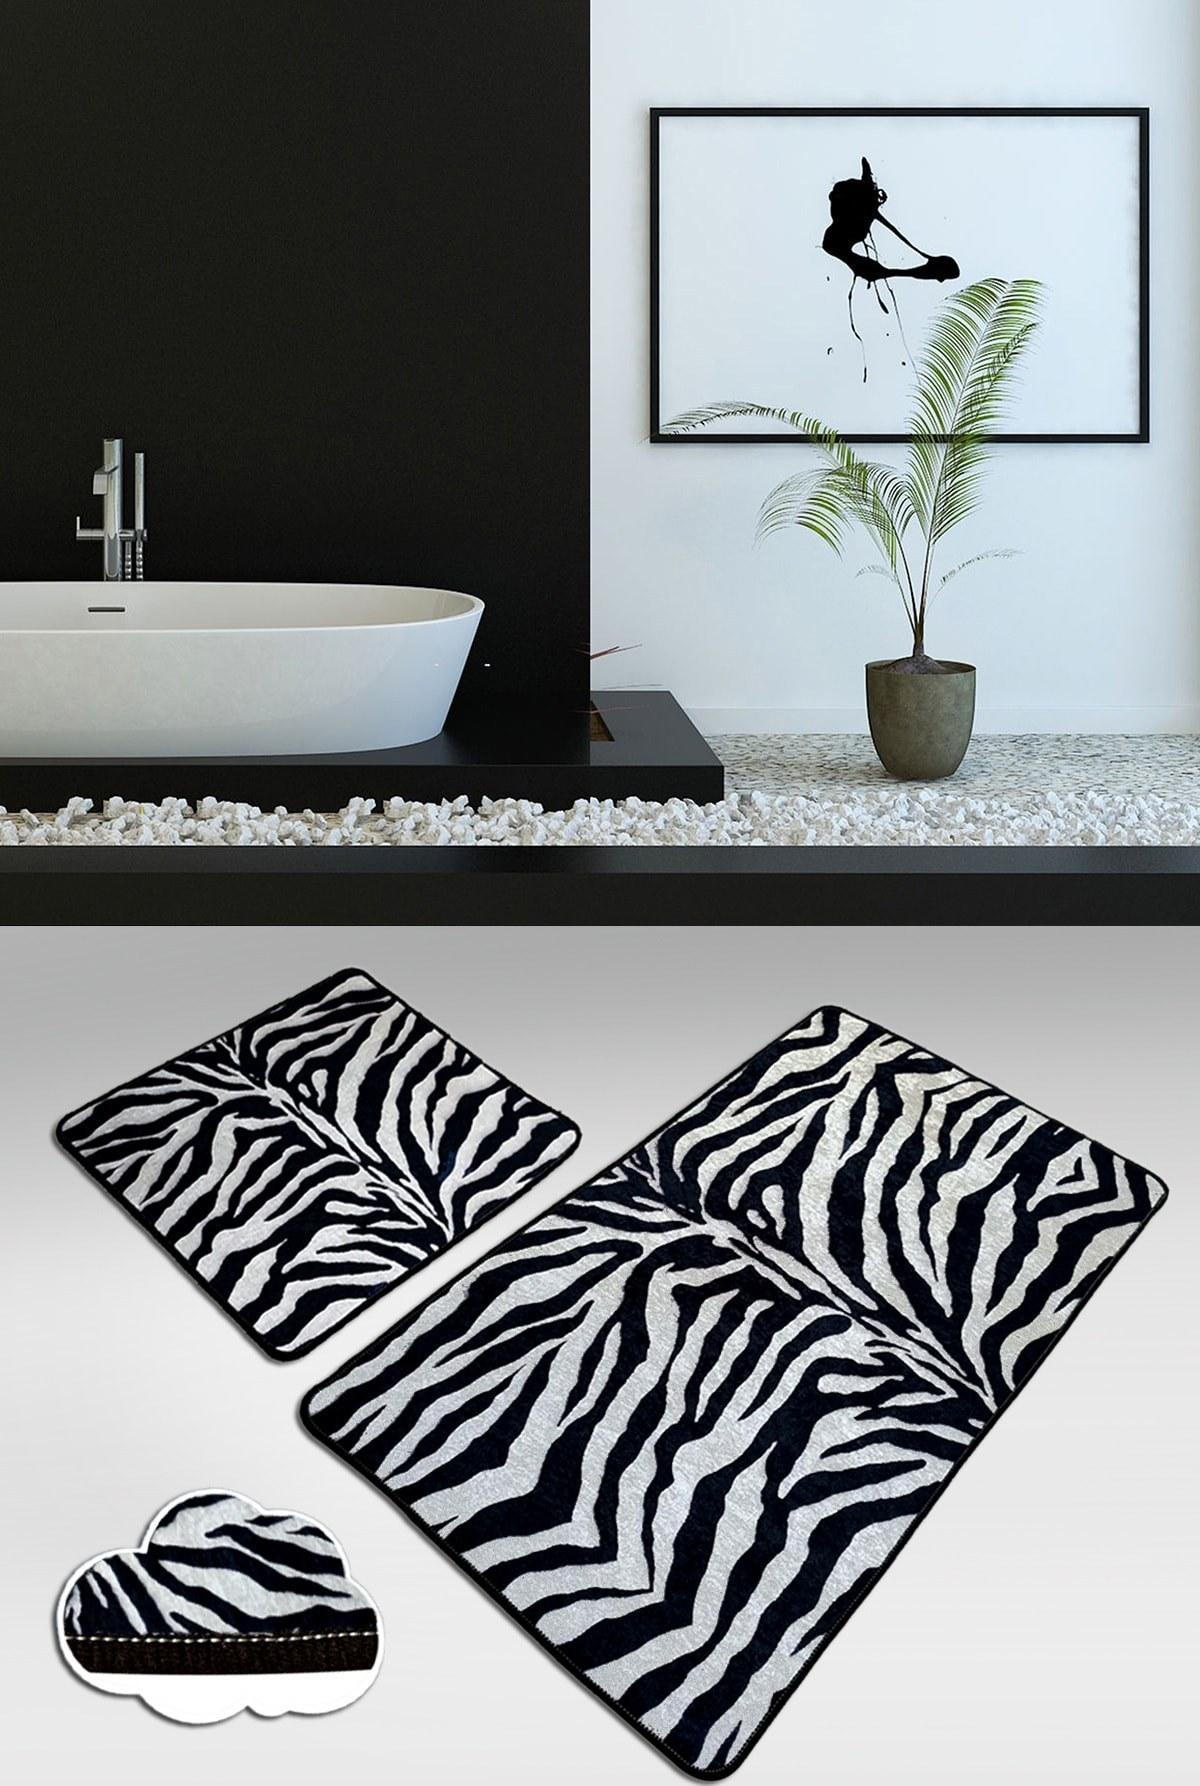 تصویر زیرپایی حمام فرش ست قابل شستشو کف لیز نمیخورد 2تکه برند Chilai Home کد 1617720569